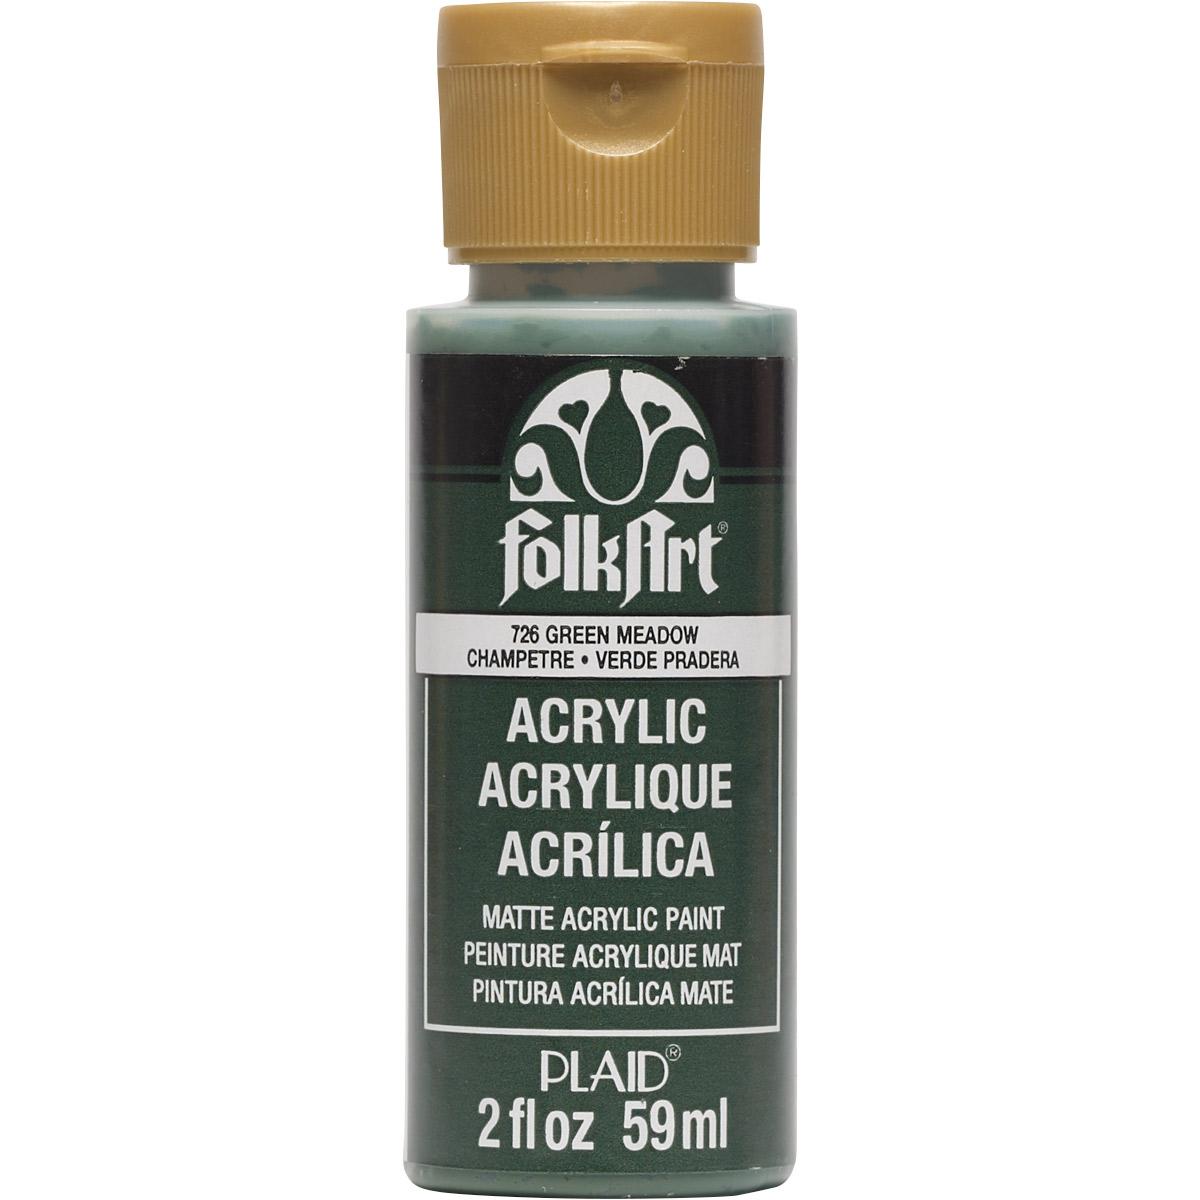 FolkArt ® Acrylic Colors - Green Meadow, 2 oz. - 726